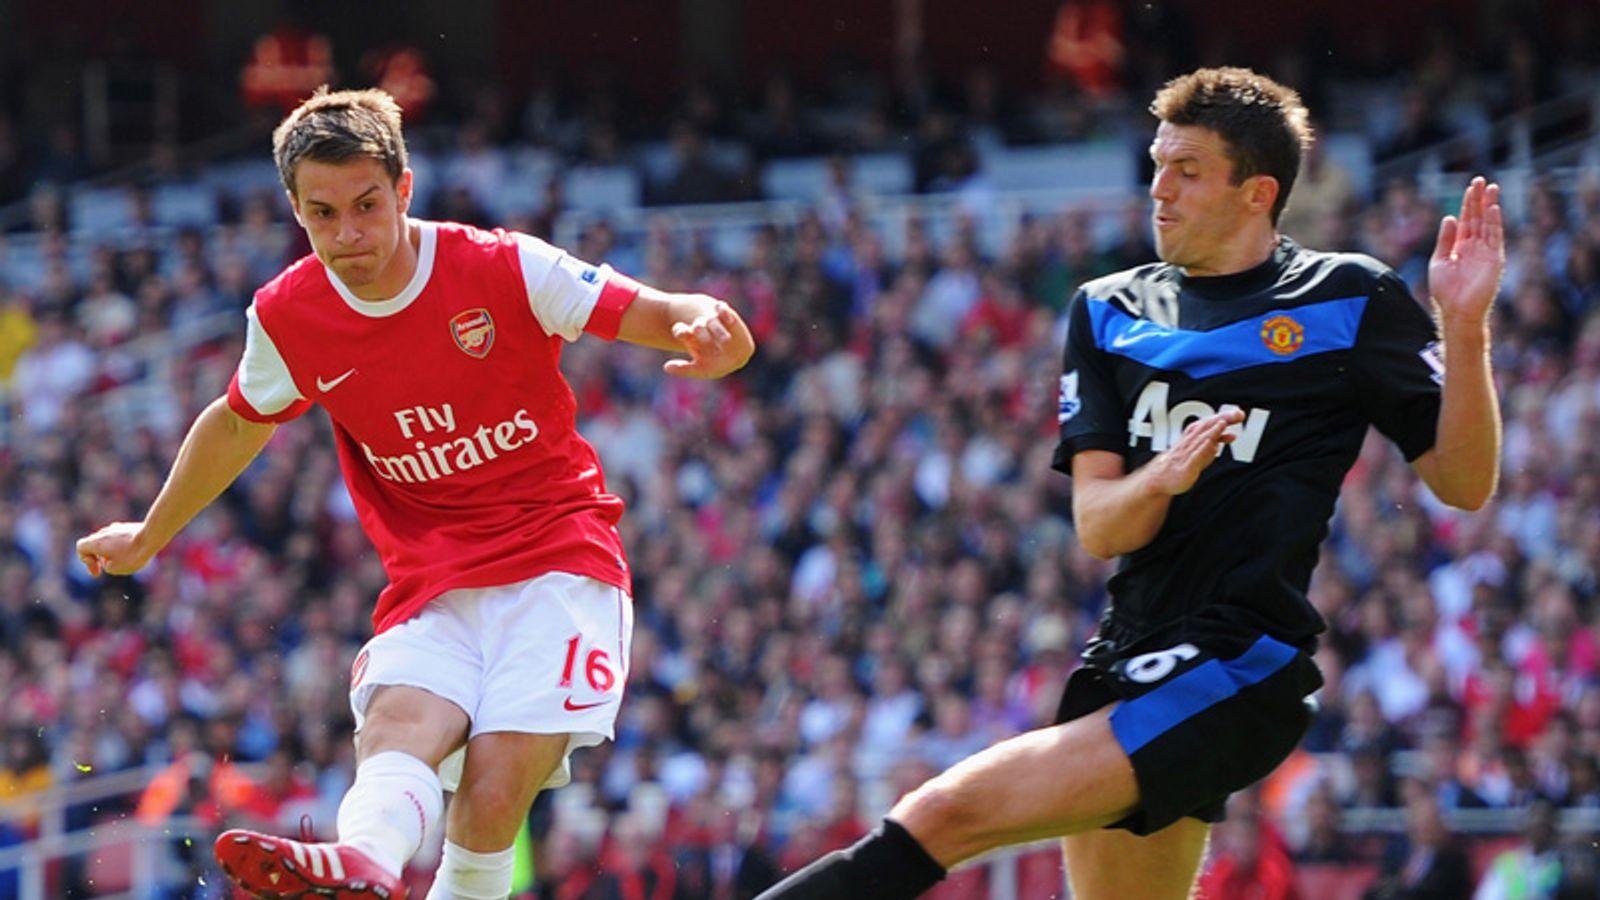 Arsenal 1 - 0 Man Utd - Match Report & Highlights